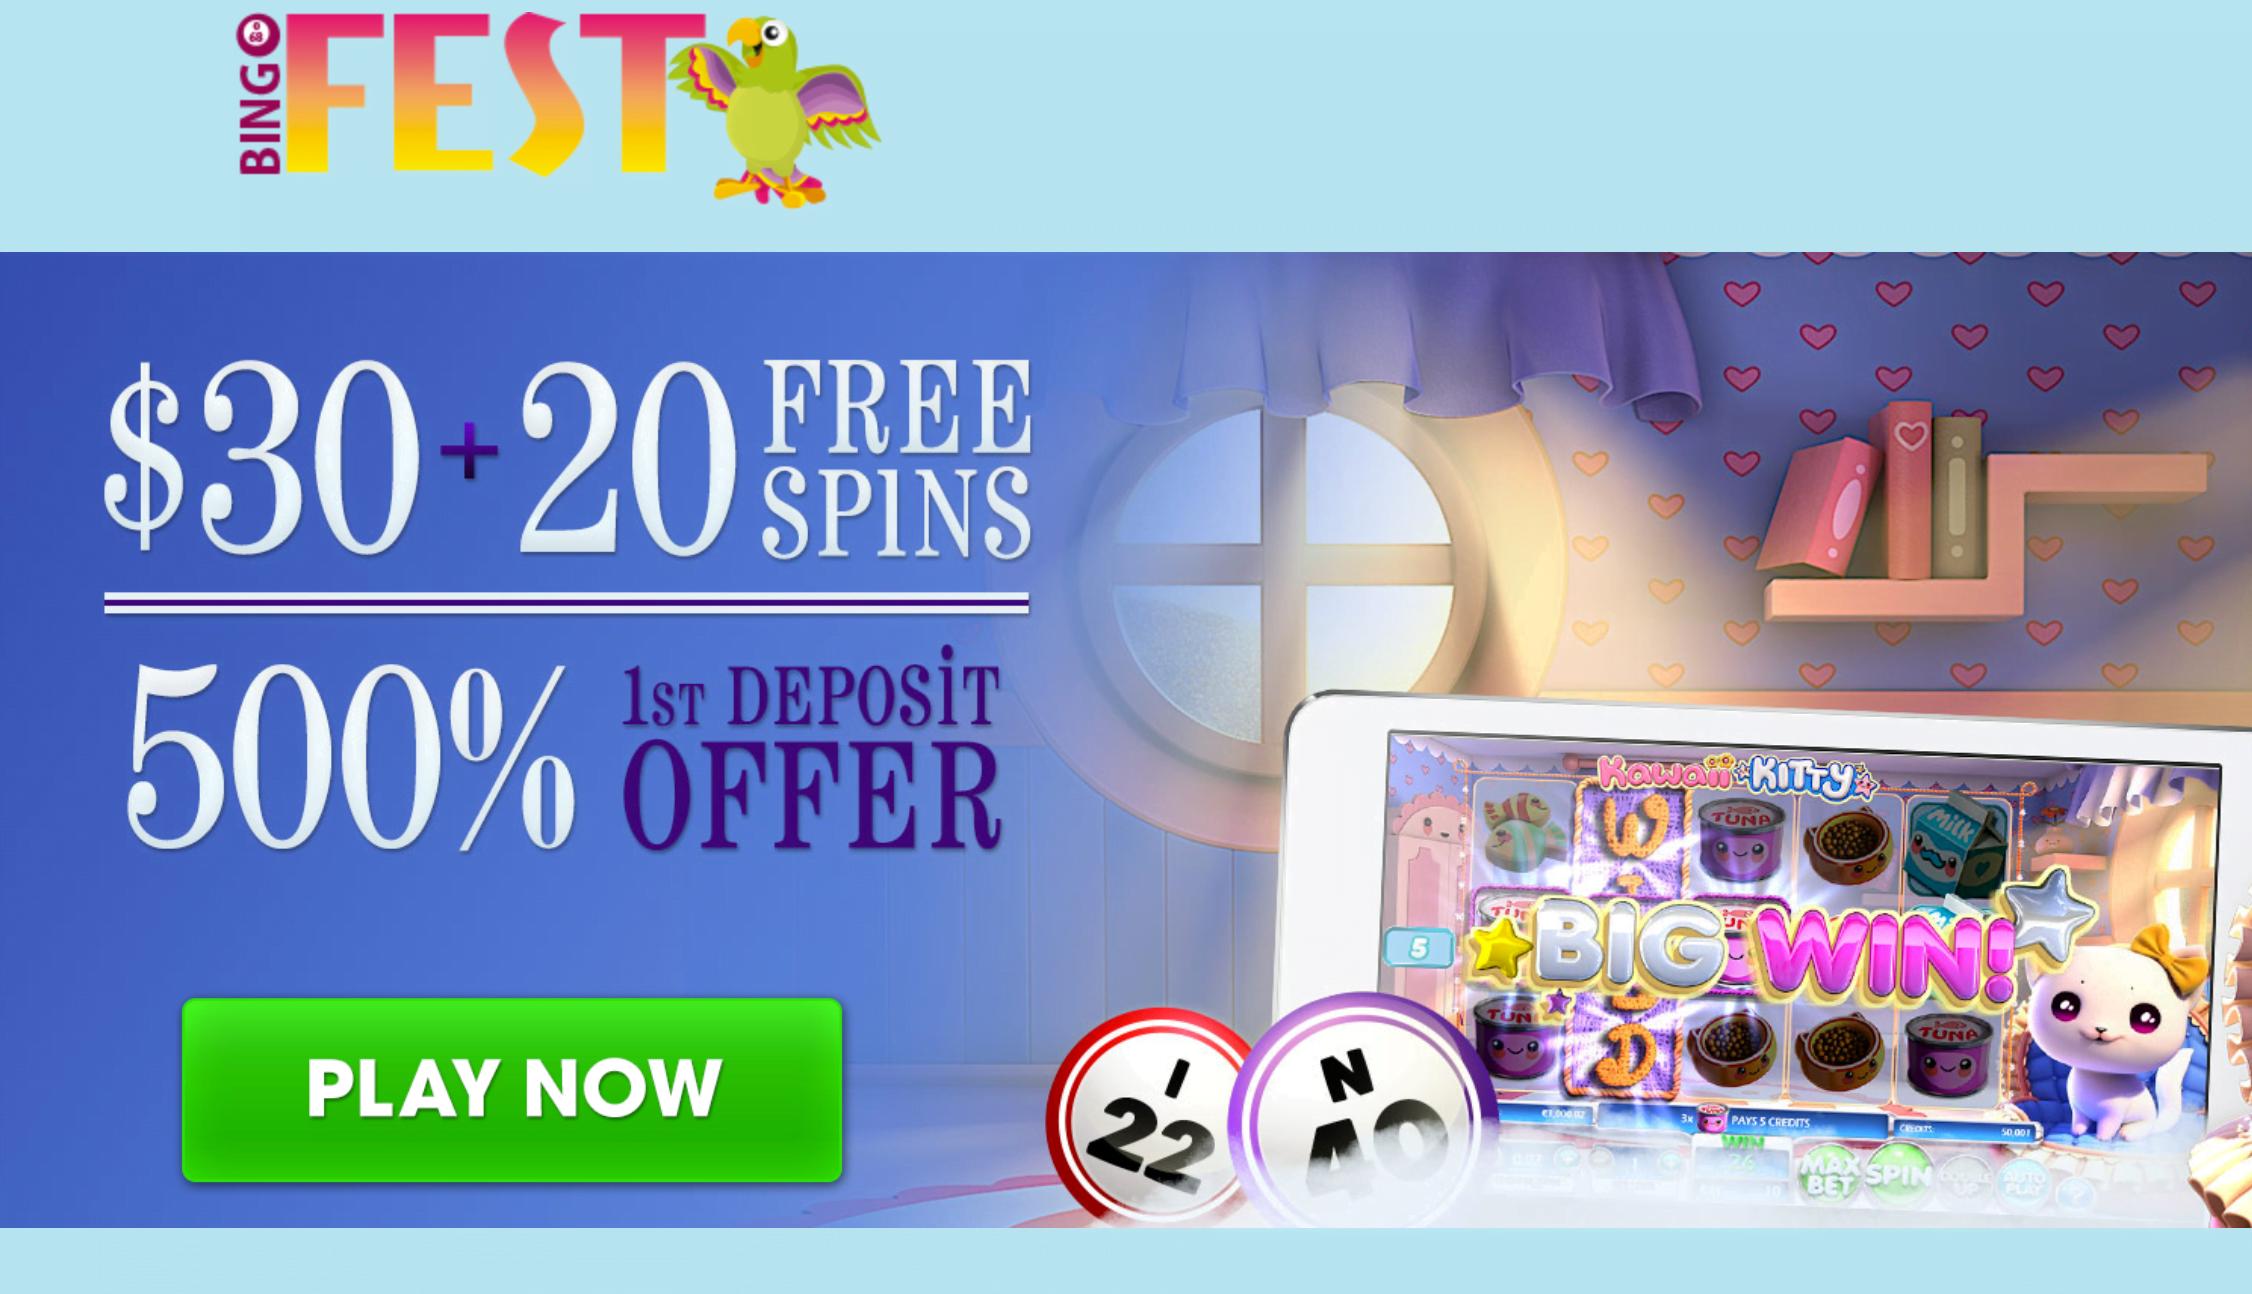 Kitty bingo free spins free